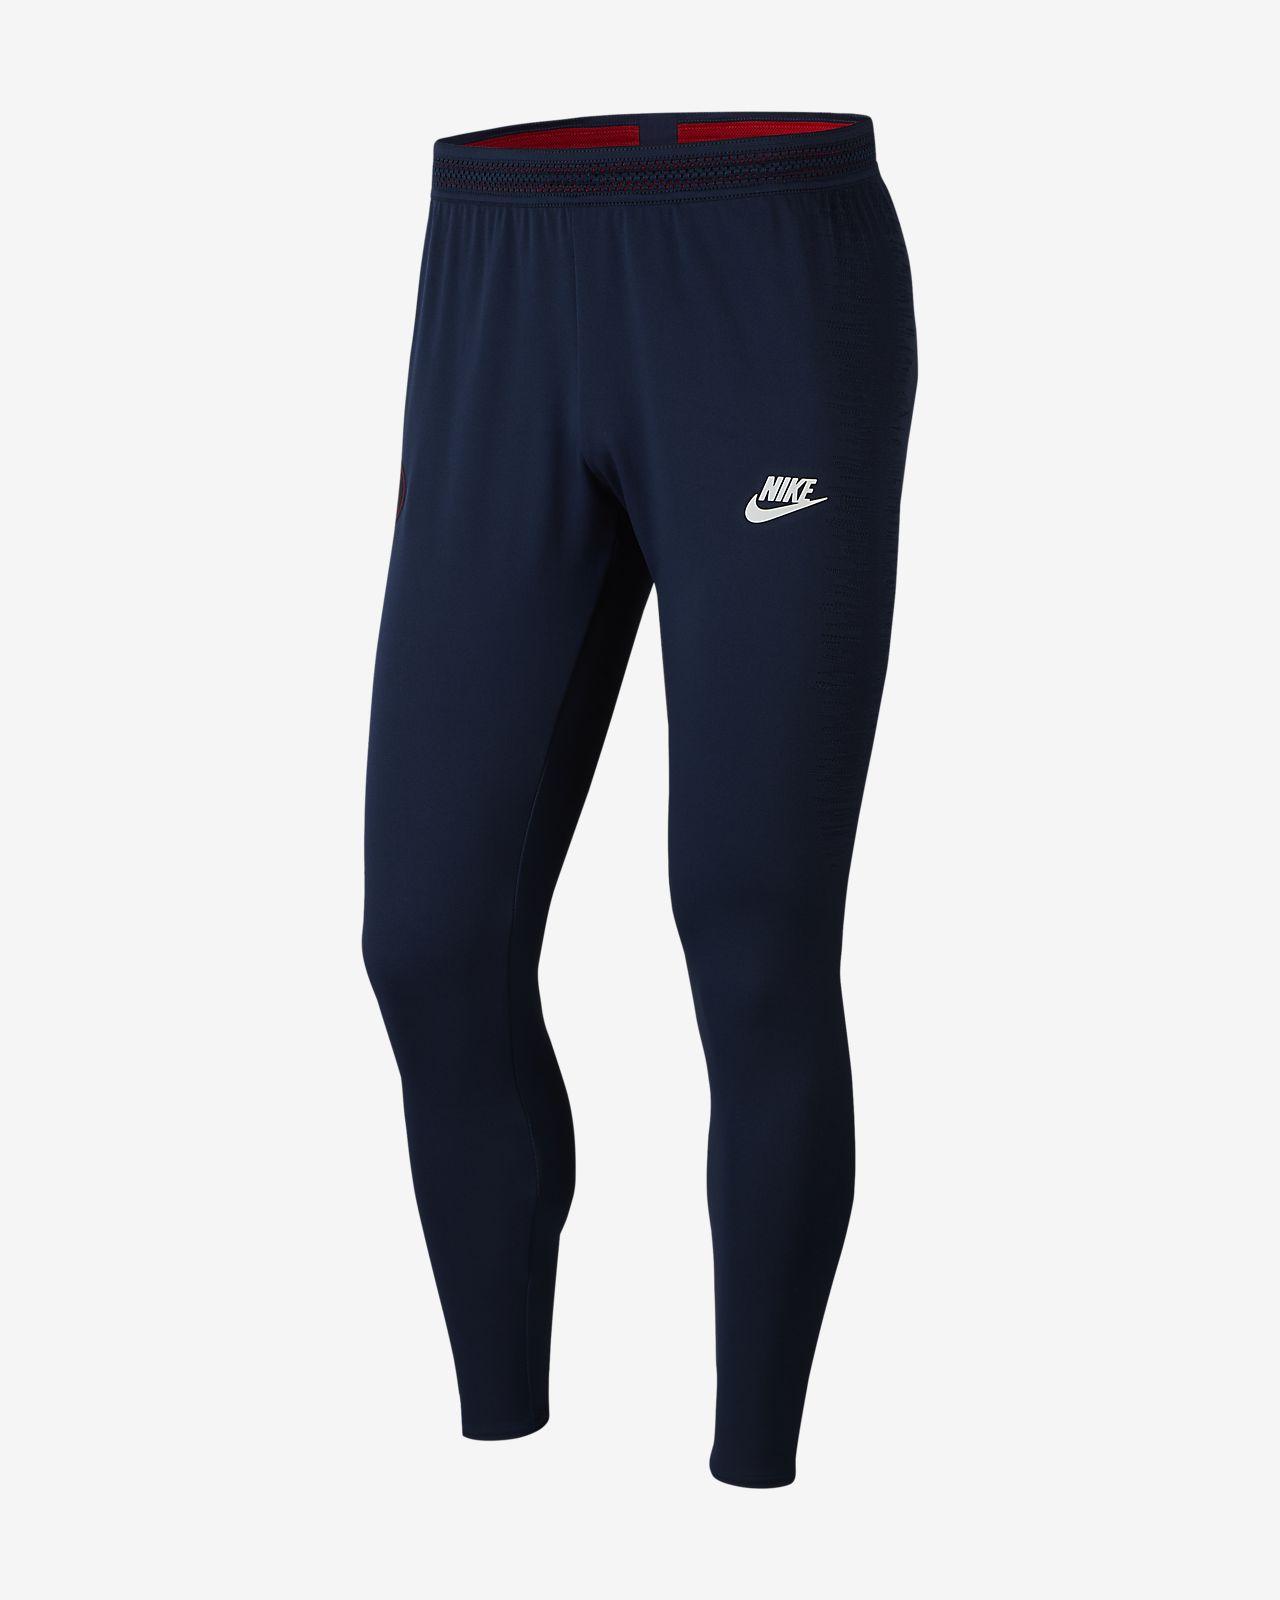 Pánské fotbalové kalhoty Nike VaporKnit Paris Saint-Germain Strike